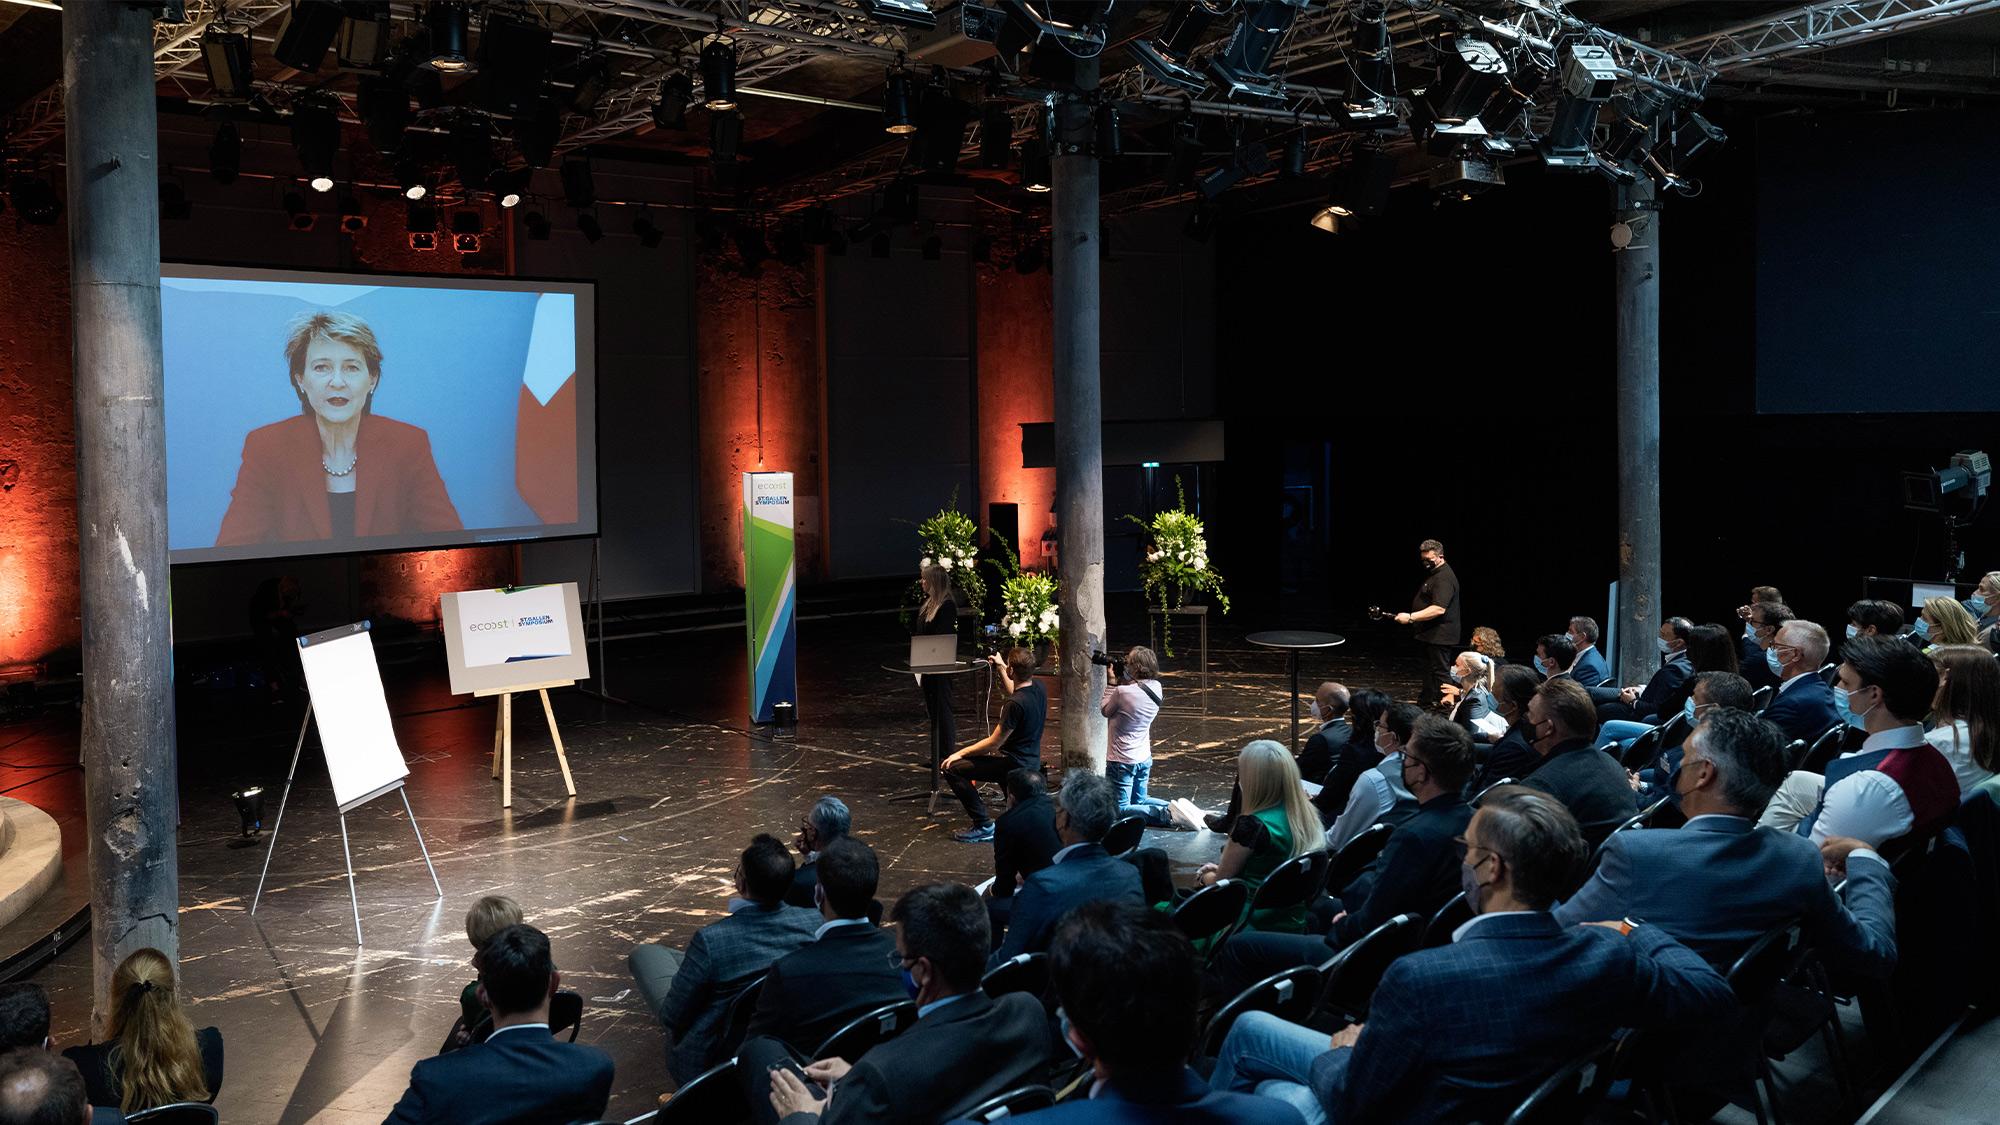 Simonetta Sommaruga at the EcoOst St.Gallen Symposium 2021